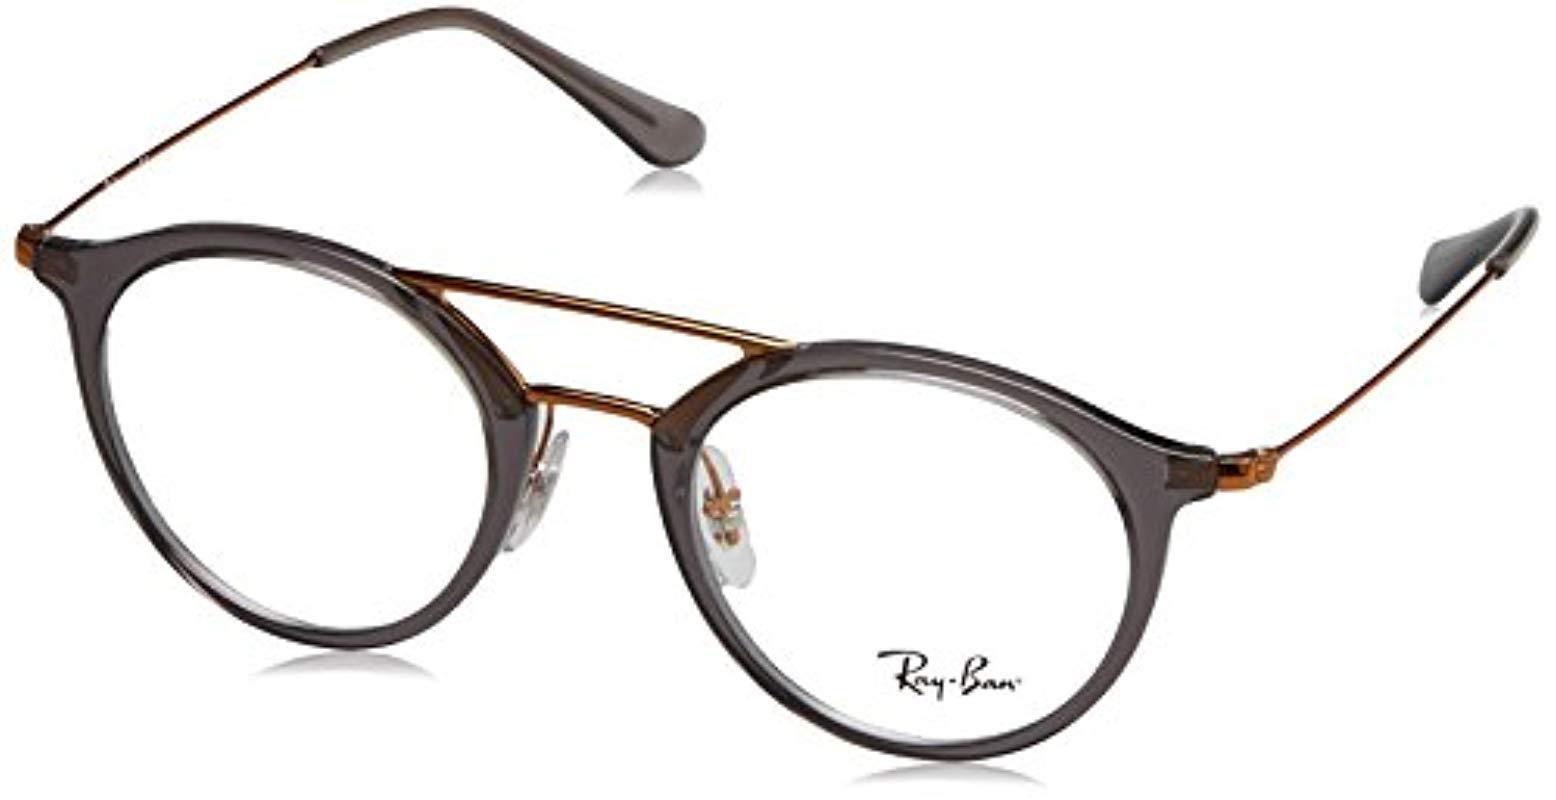 7ee0cd4f4b2 Ray-Ban. Women s Gray 0rx 7097 5633 49 Optical Frames ...